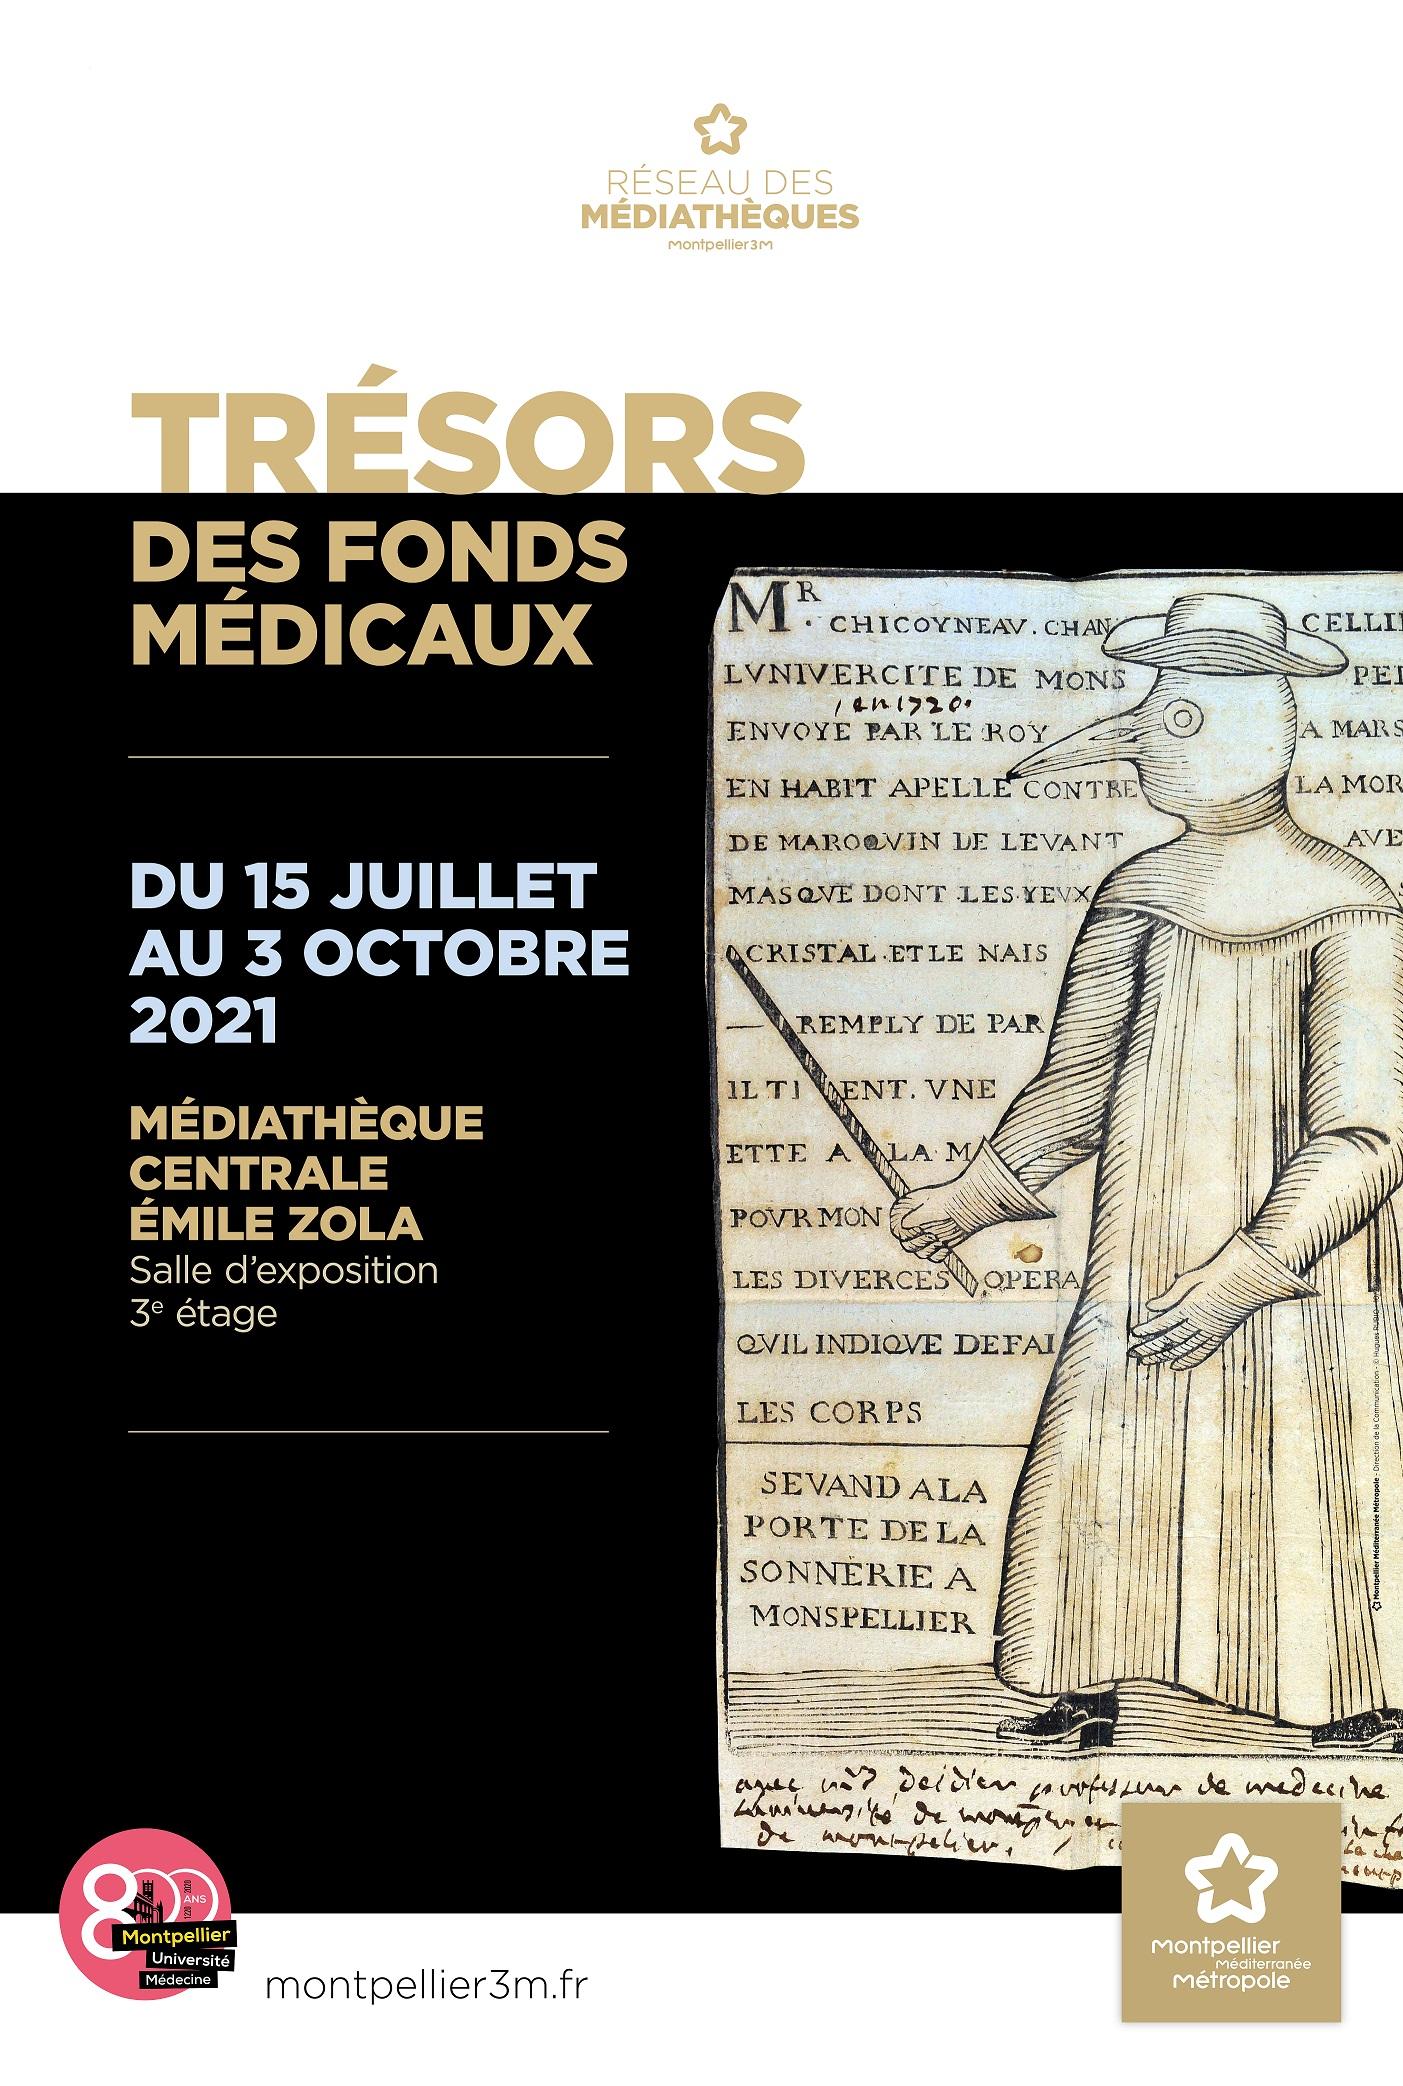 EXPOSITION MEDECINE 2021-affiche juillet 2021_page-0001.jpg